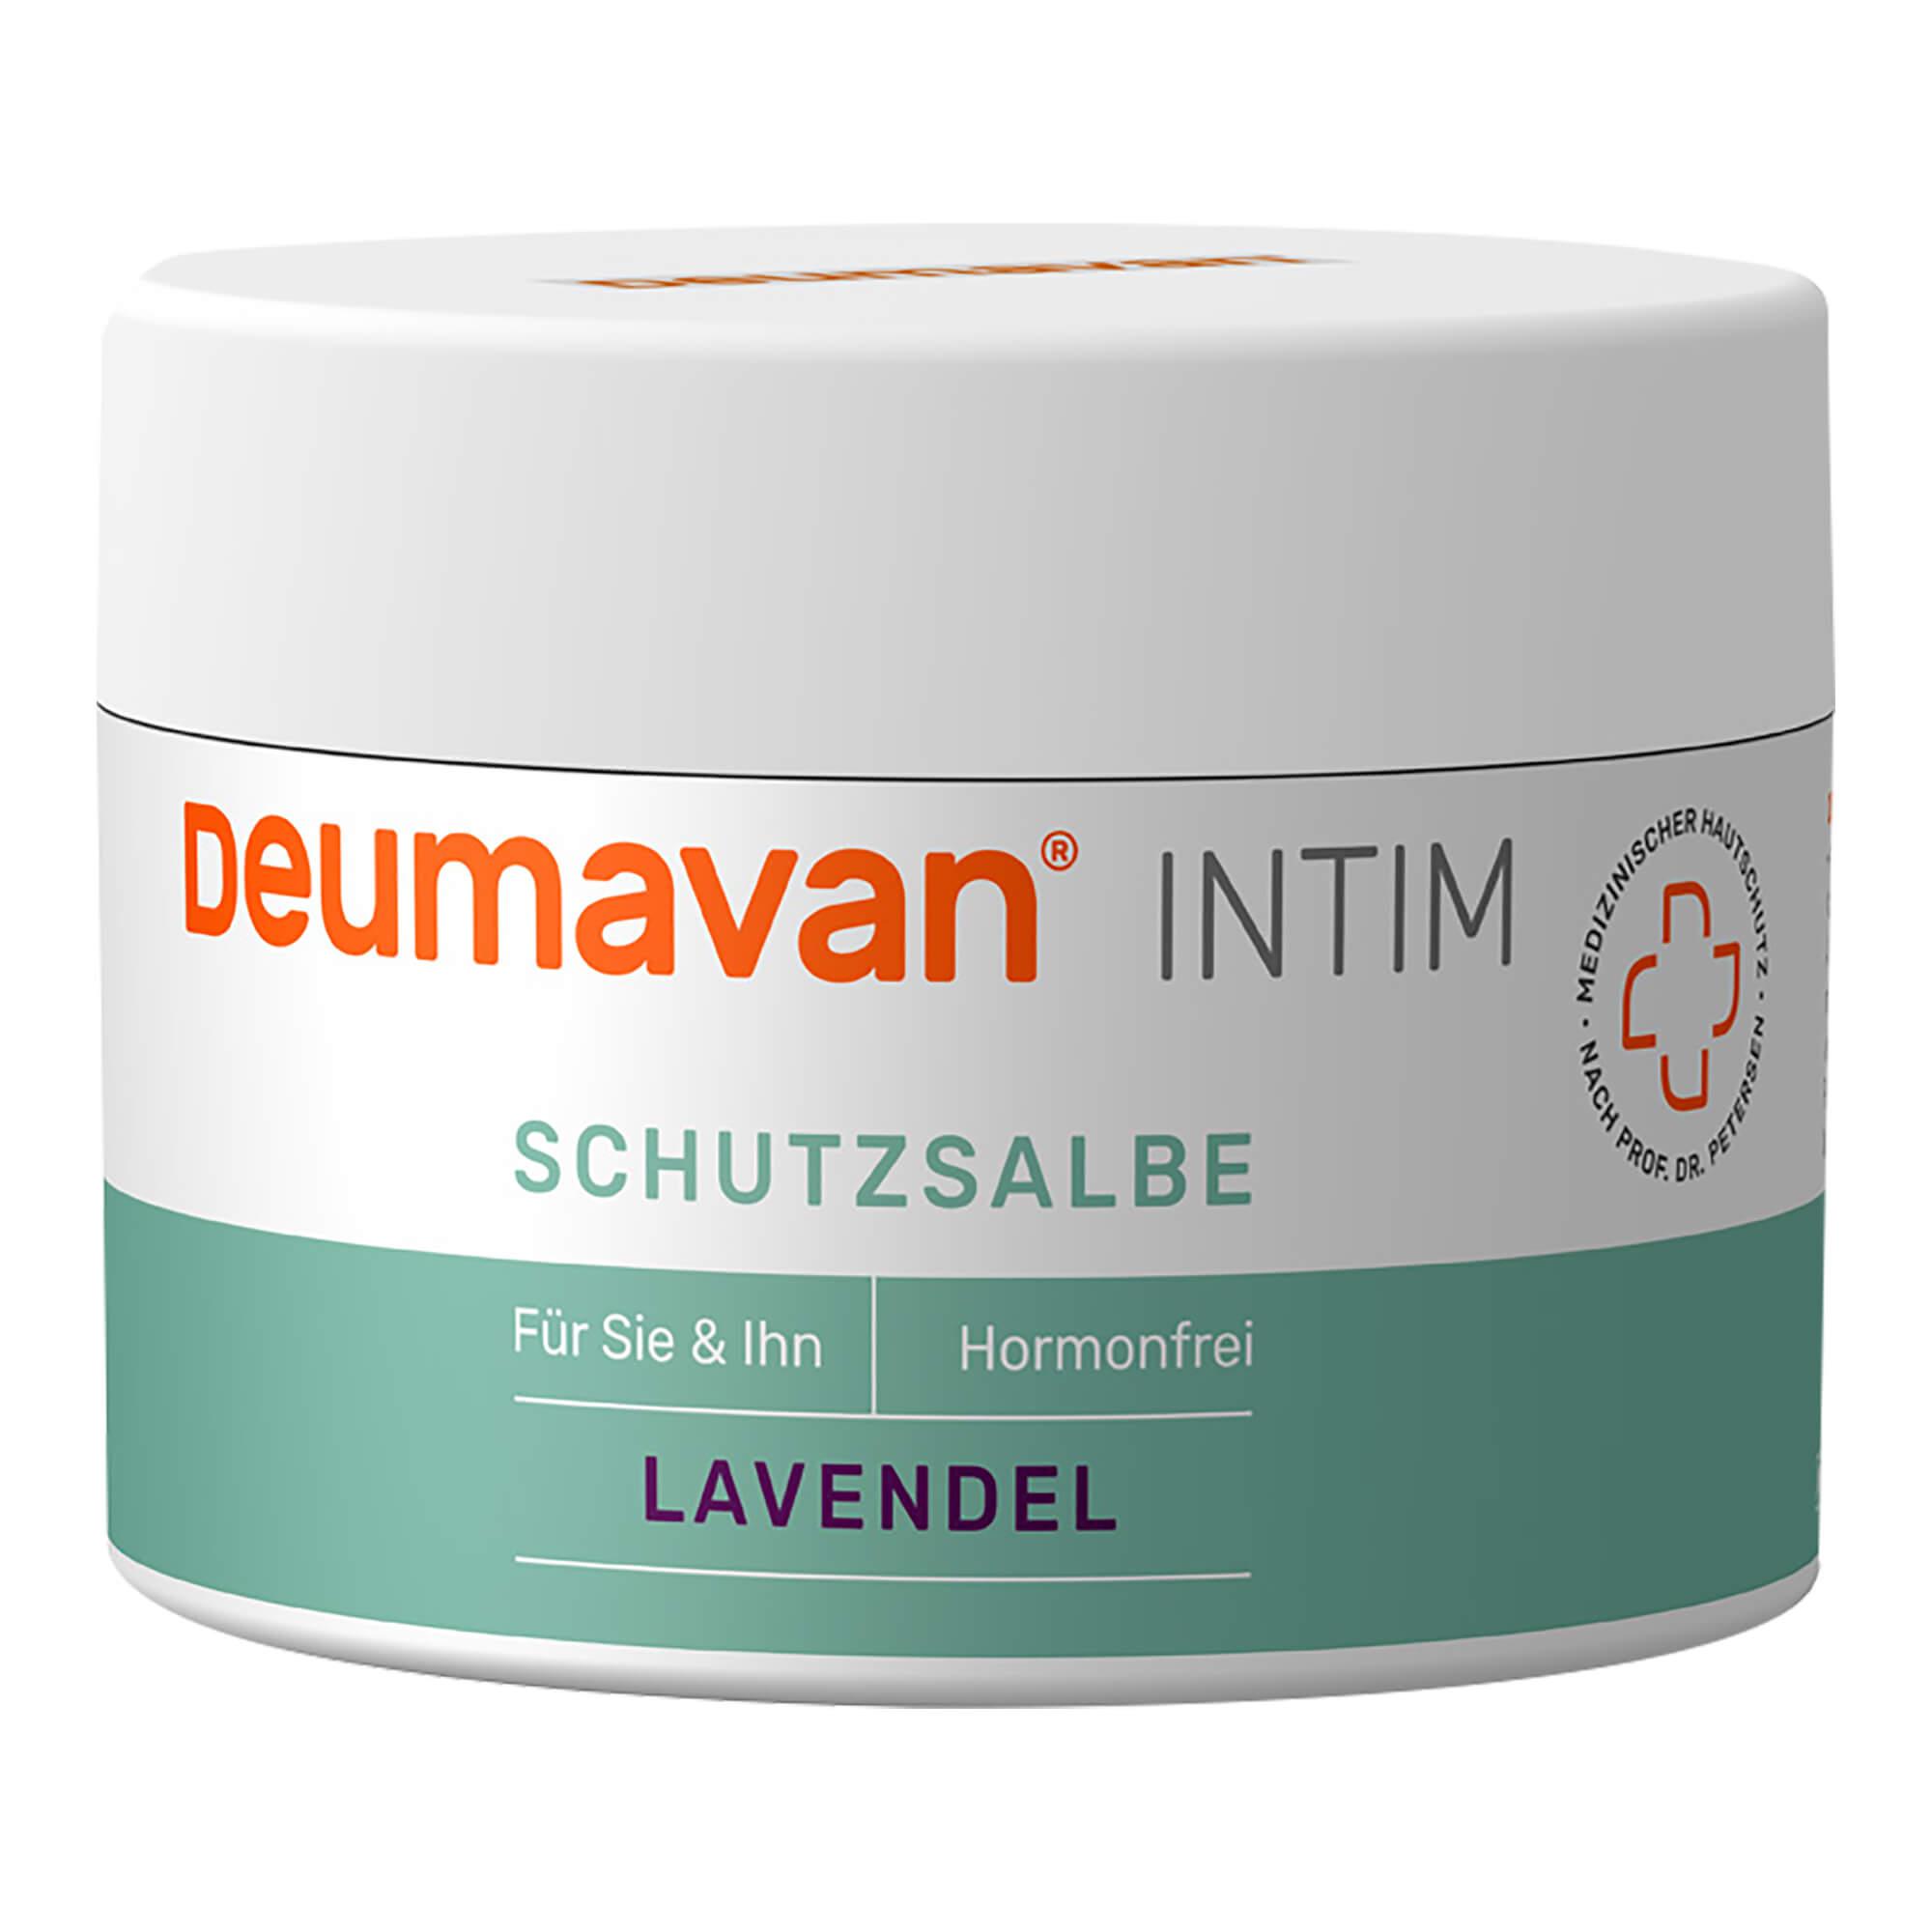 Deumavan Schutzsalbe mit Lavendel Dose Intimpflege